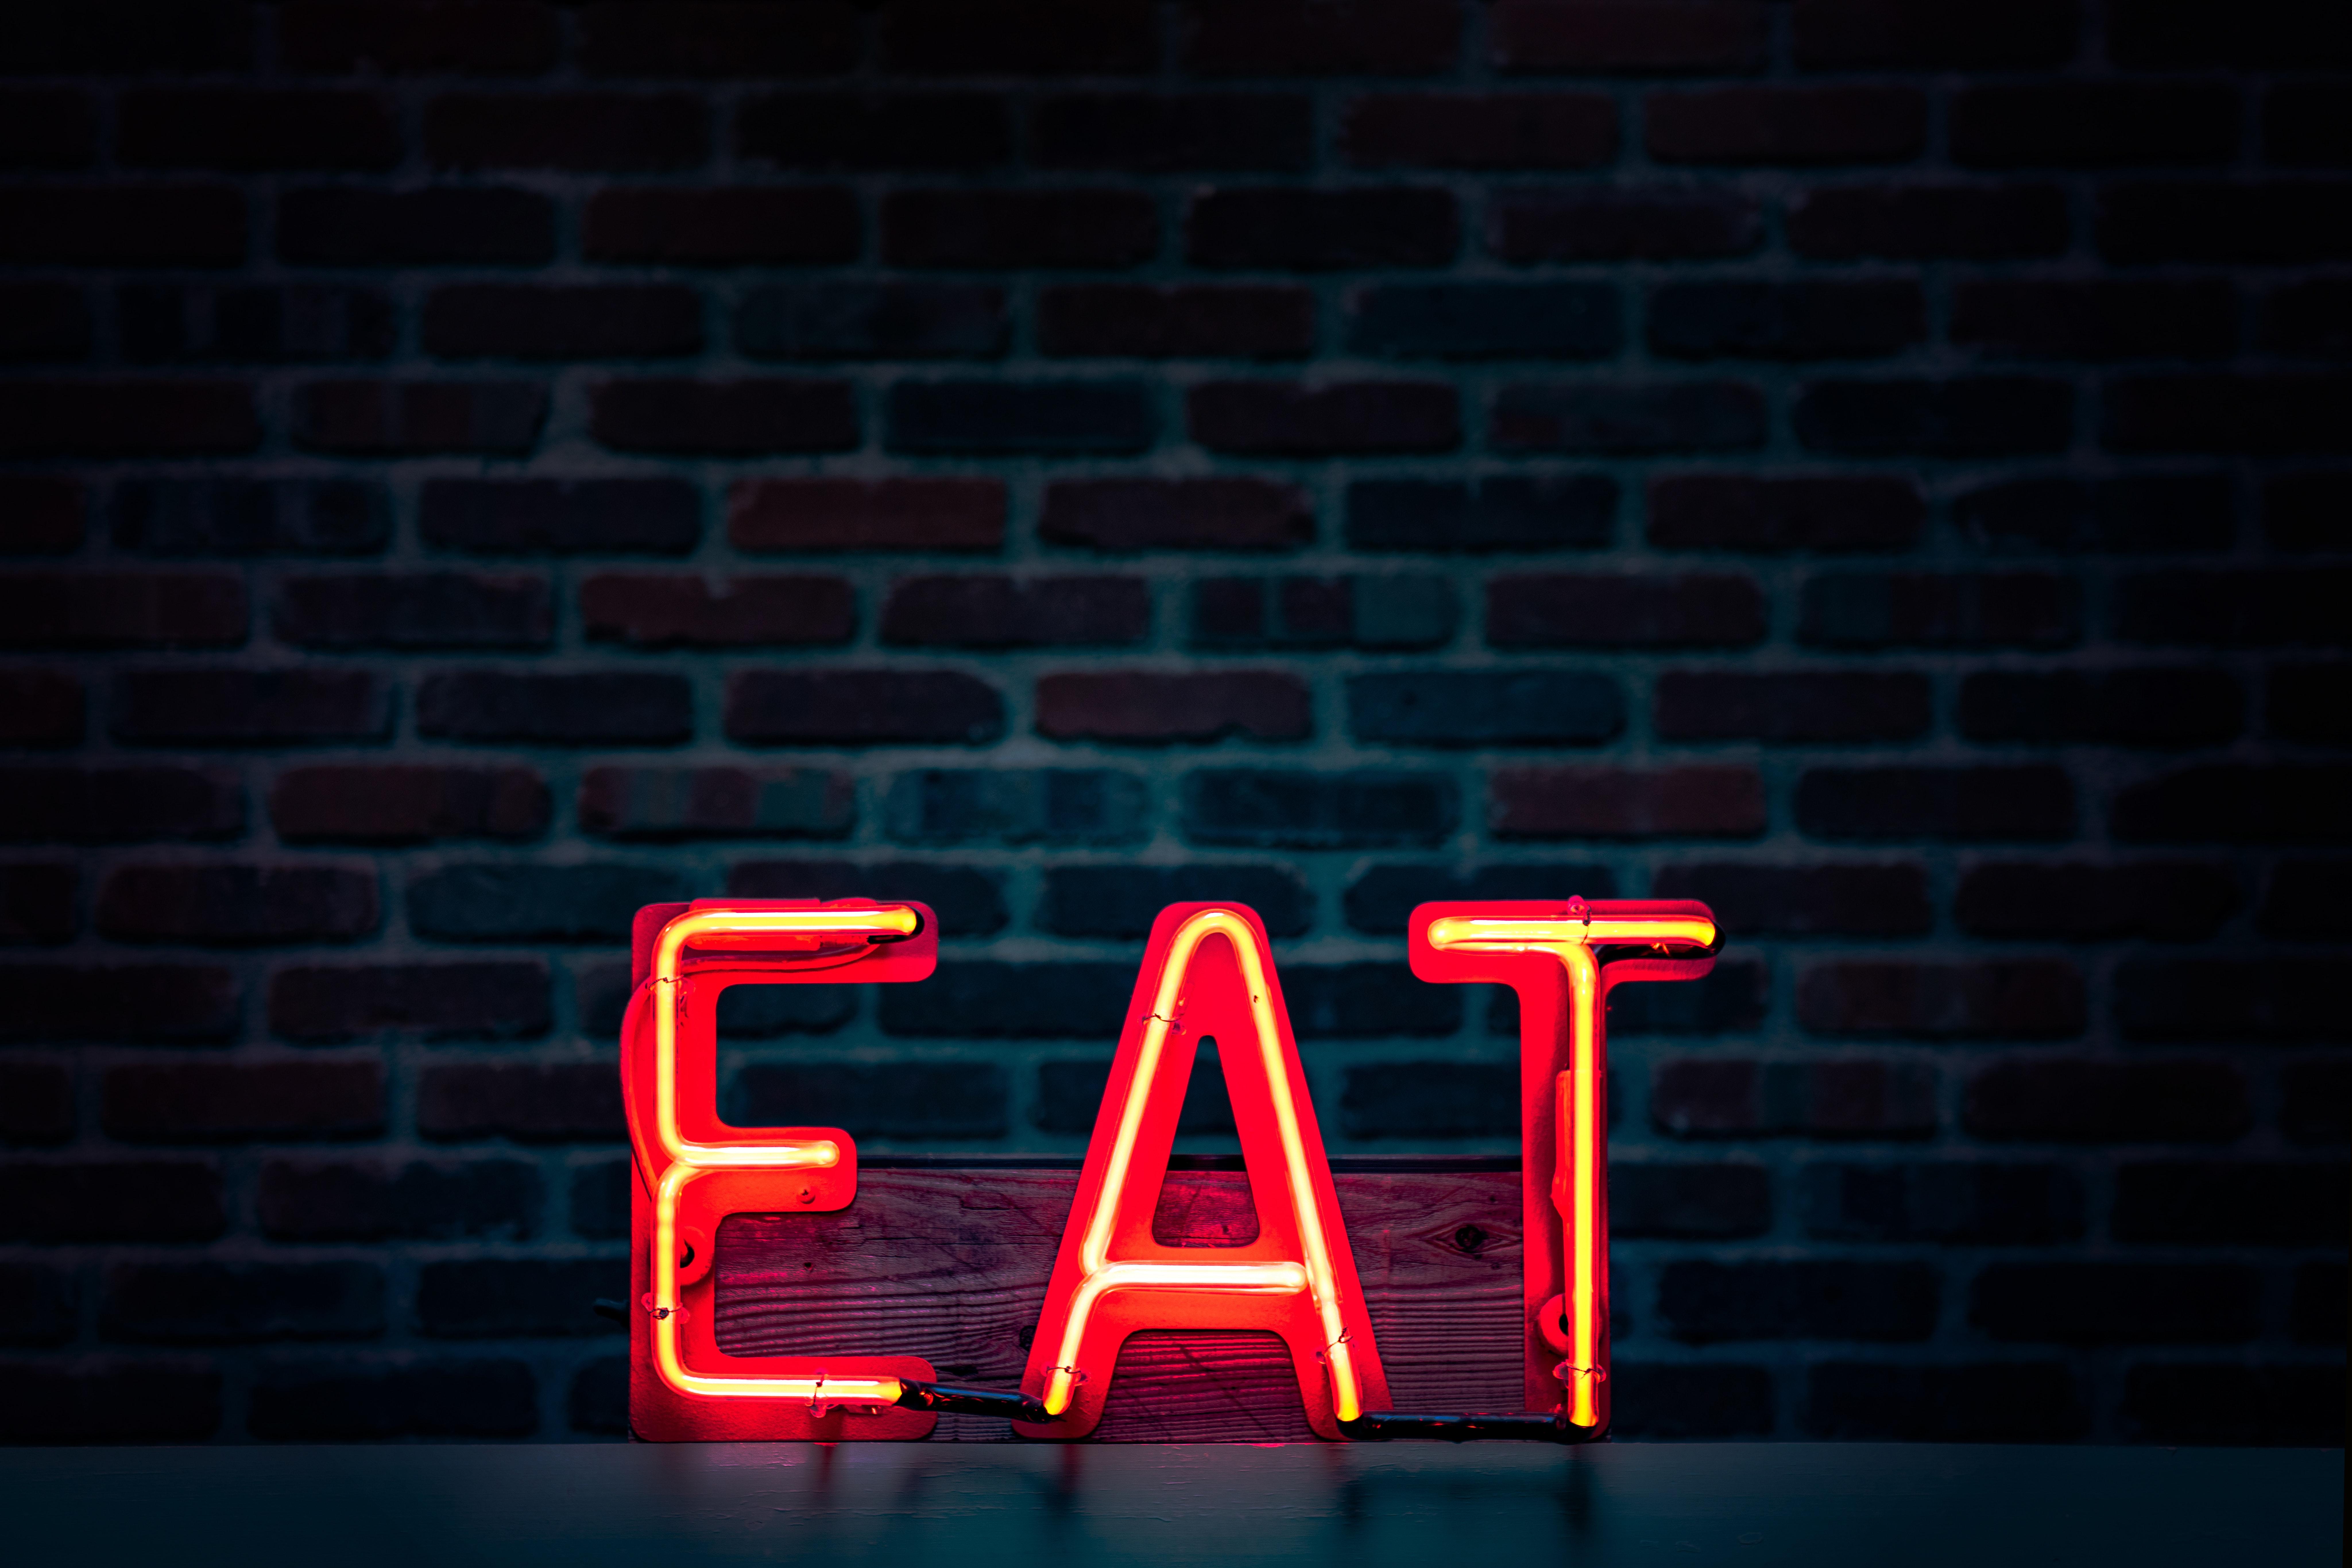 Eating disorders & addiction